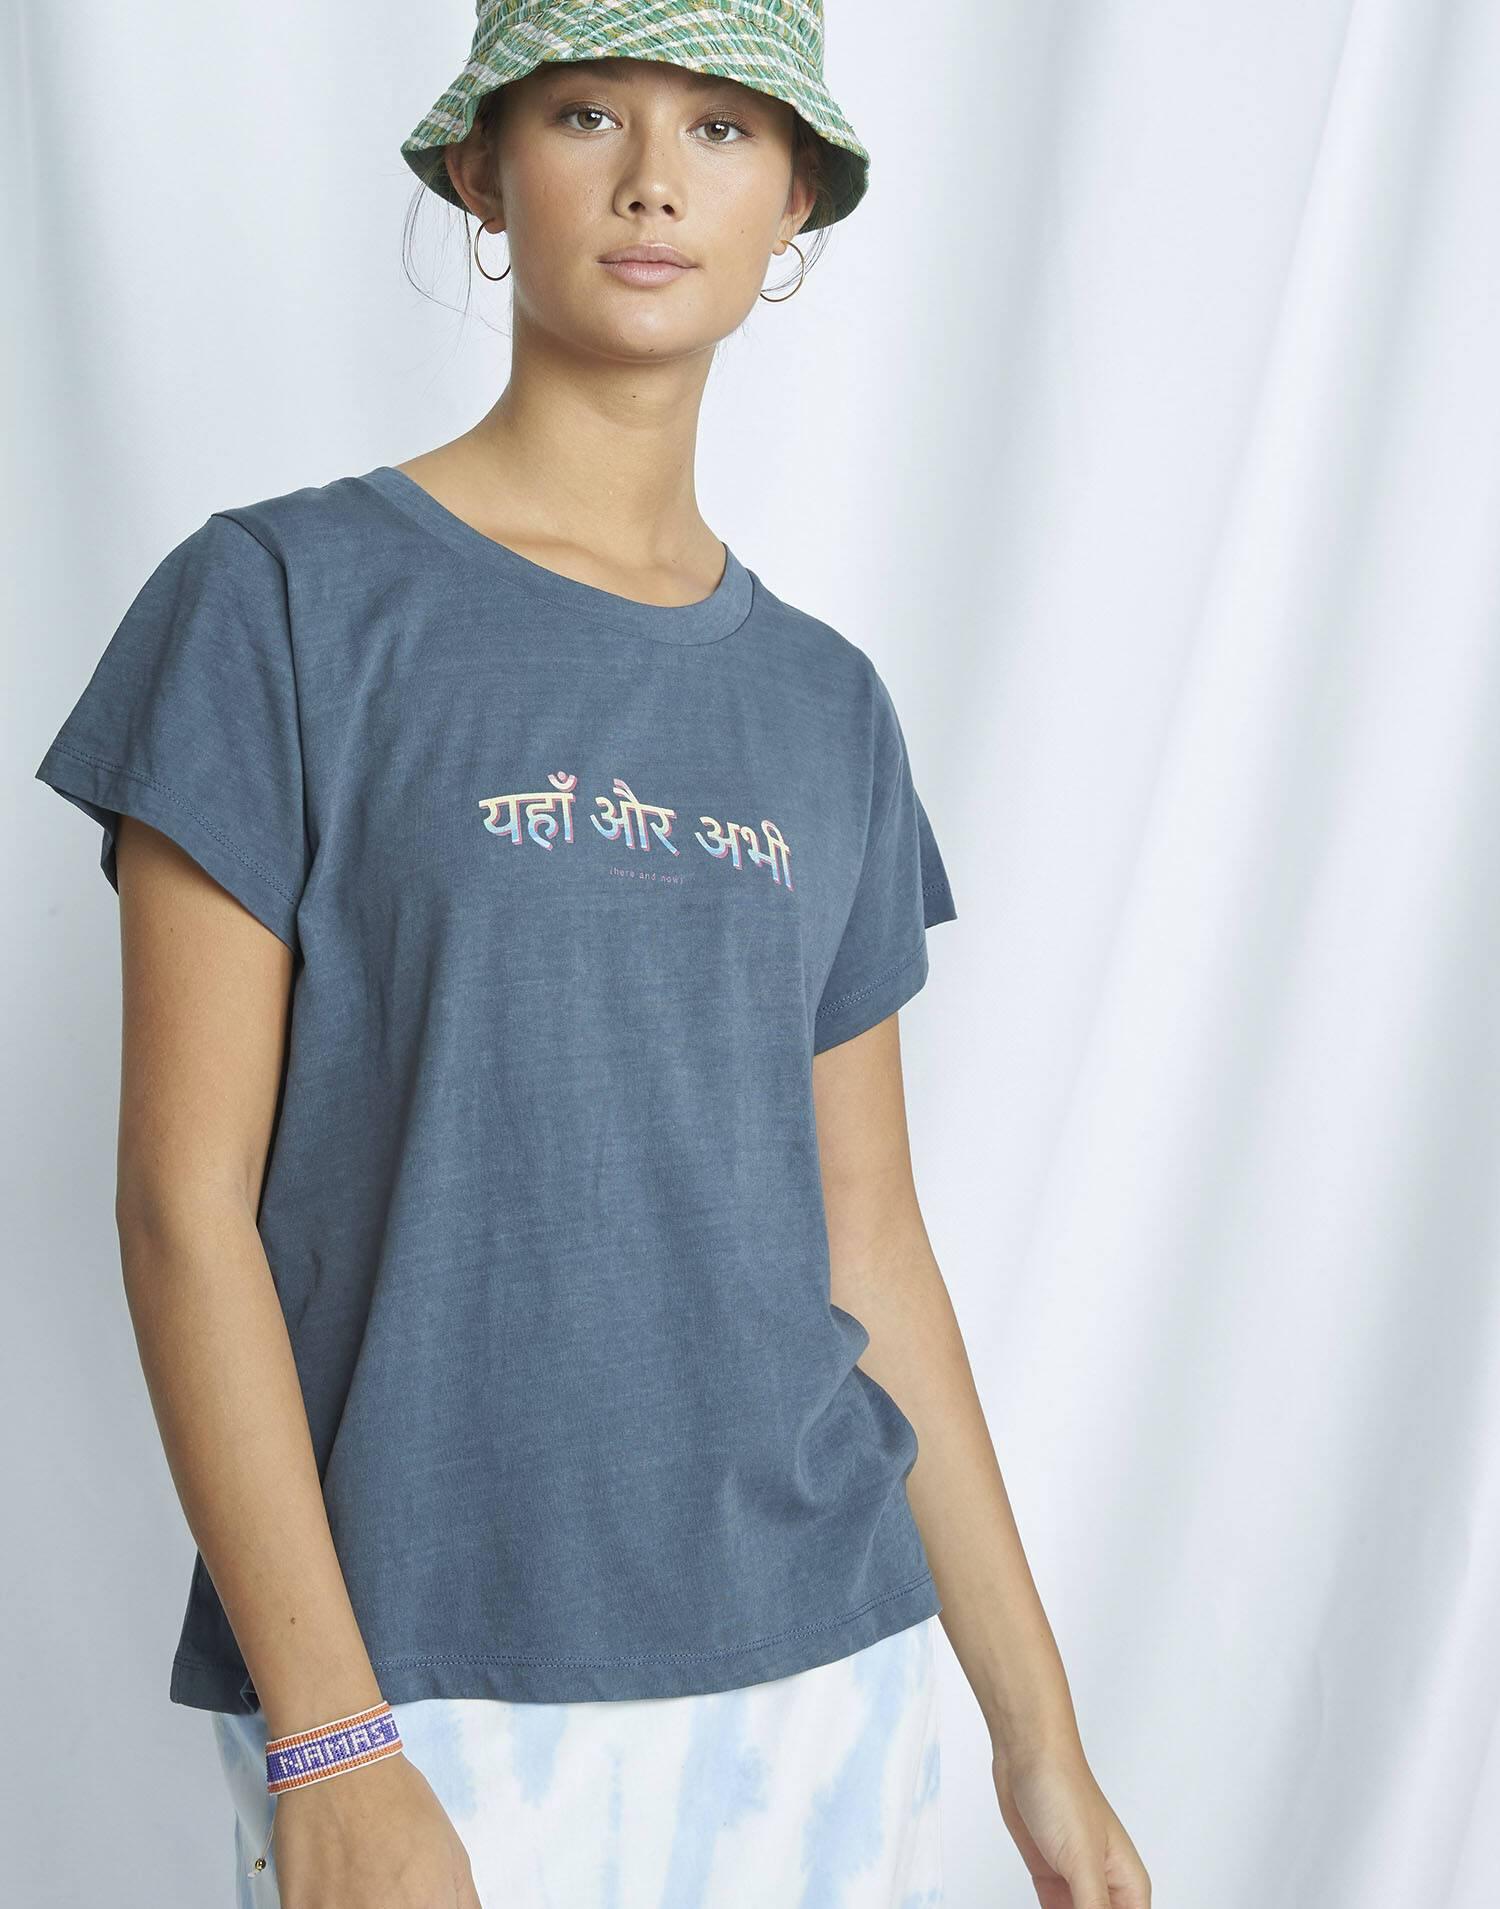 Sanscriti organic t-shirt